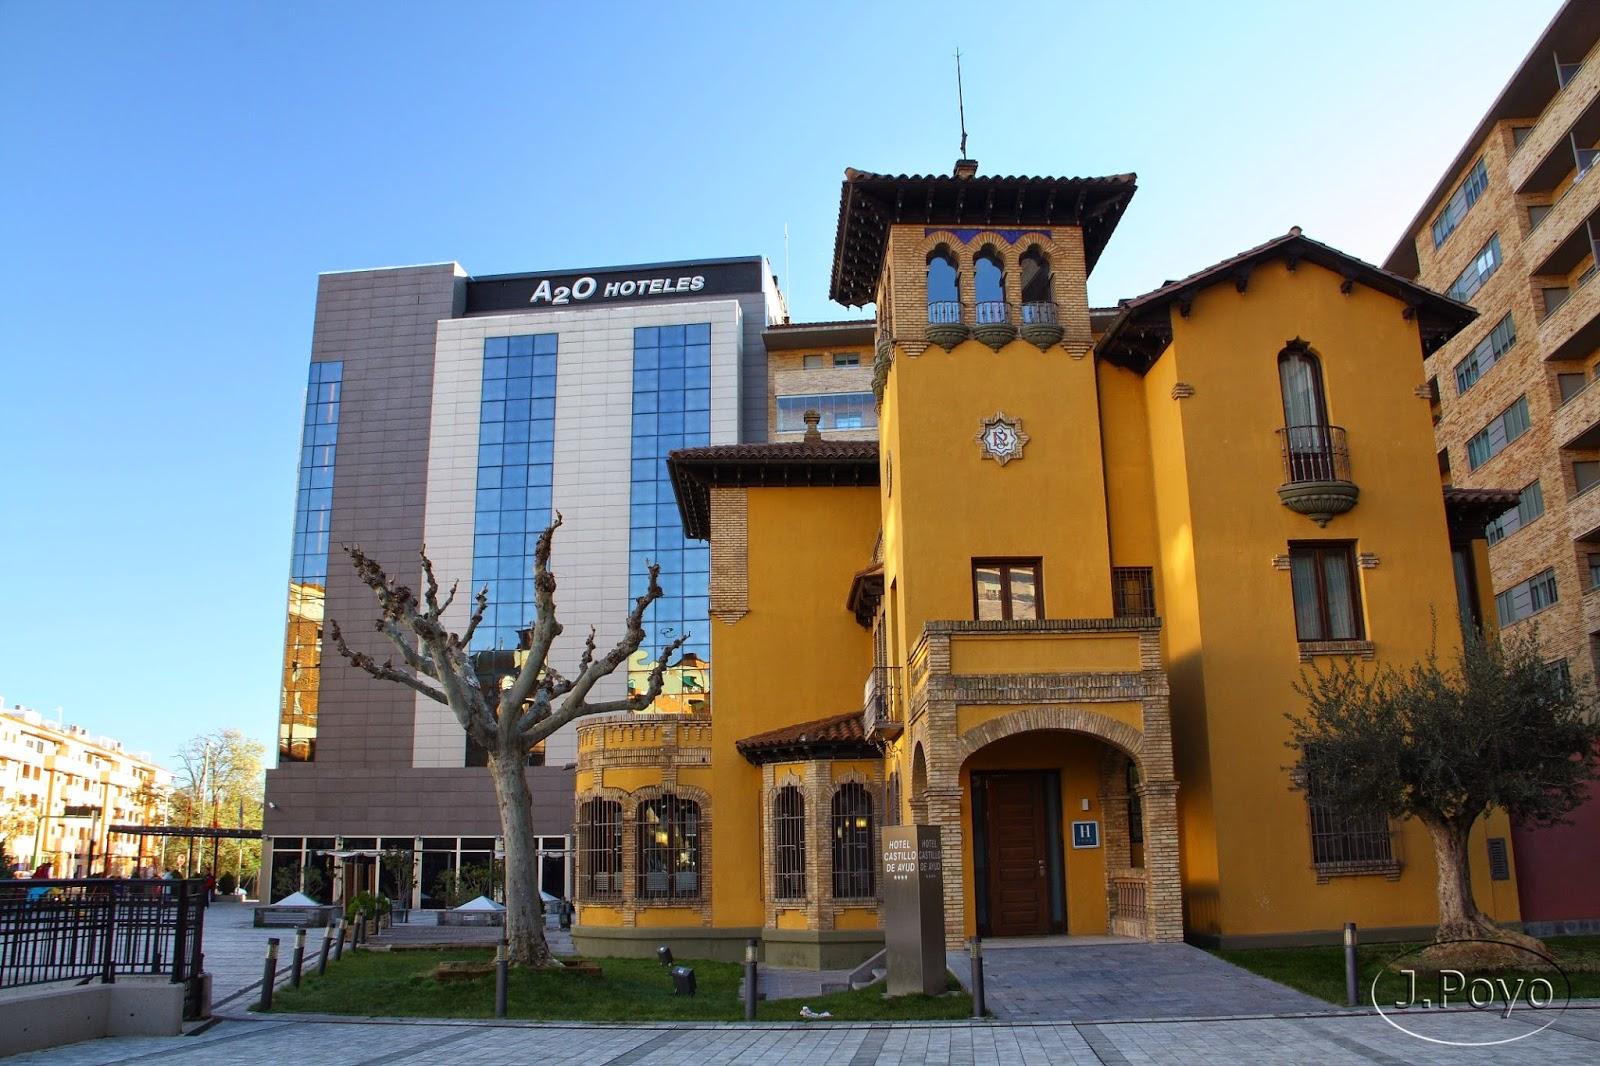 Hotel d eCalatayud